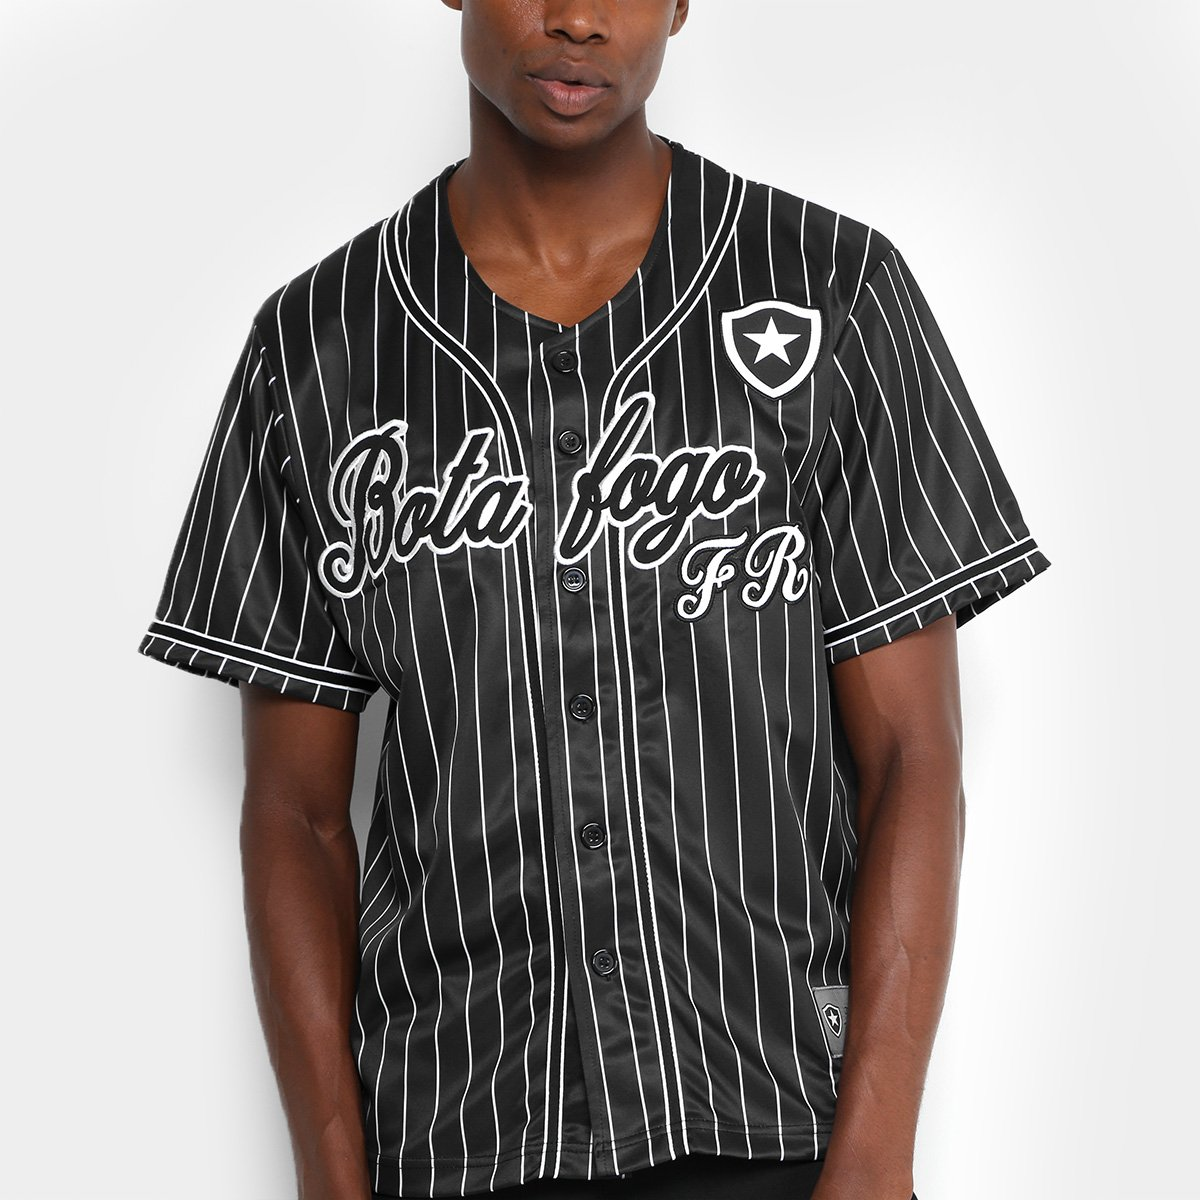 Camisa Botafogo Baseball Masculina - Preto e Branco - Compre Agora ... 96011517f3ba7